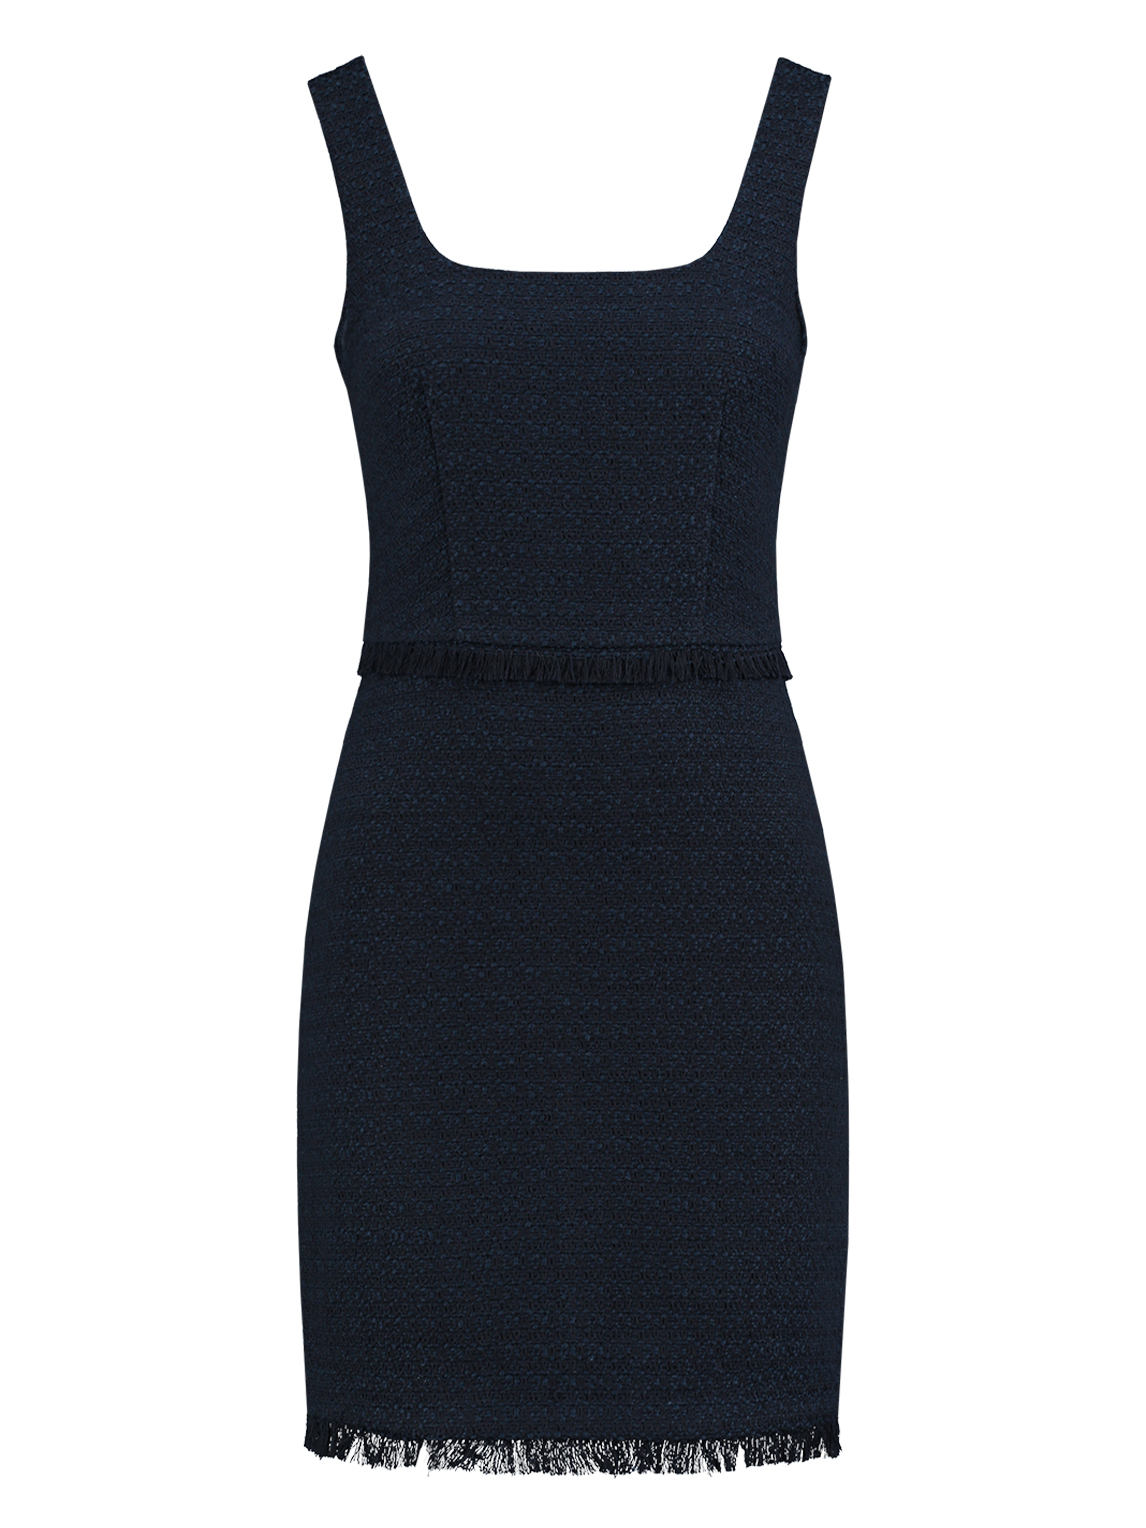 Donker blauwe dames jurk Nikkie - Laisa Dress - N5-209 1904 7800